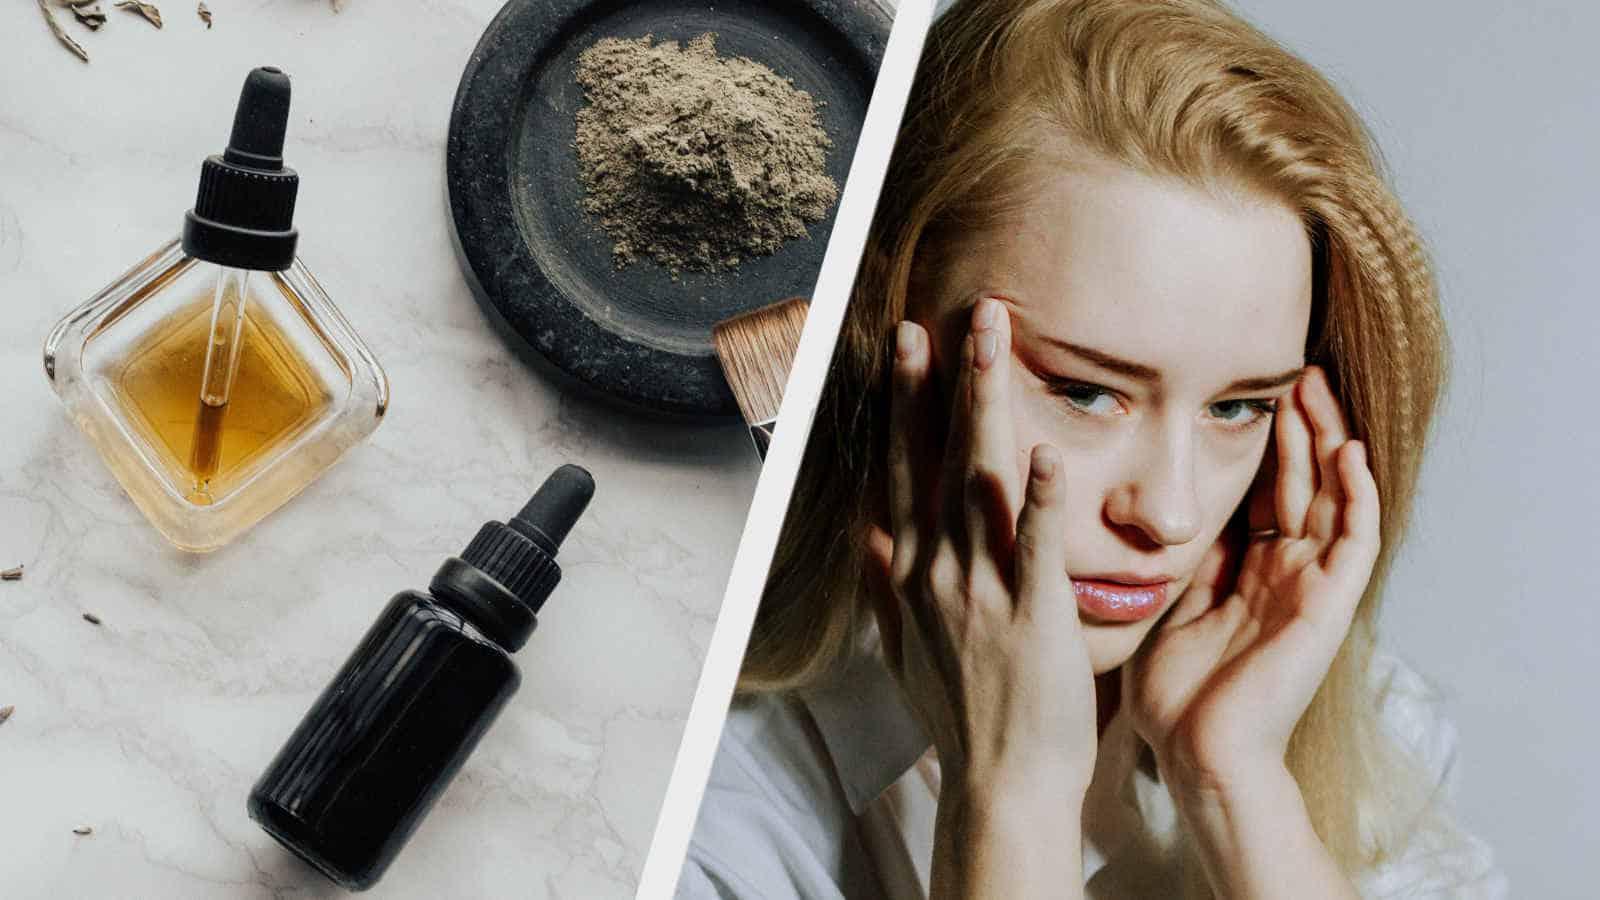 CBD-Öl gegen Schmerzen- So wirkt Cannabidiol auf Schmerzen